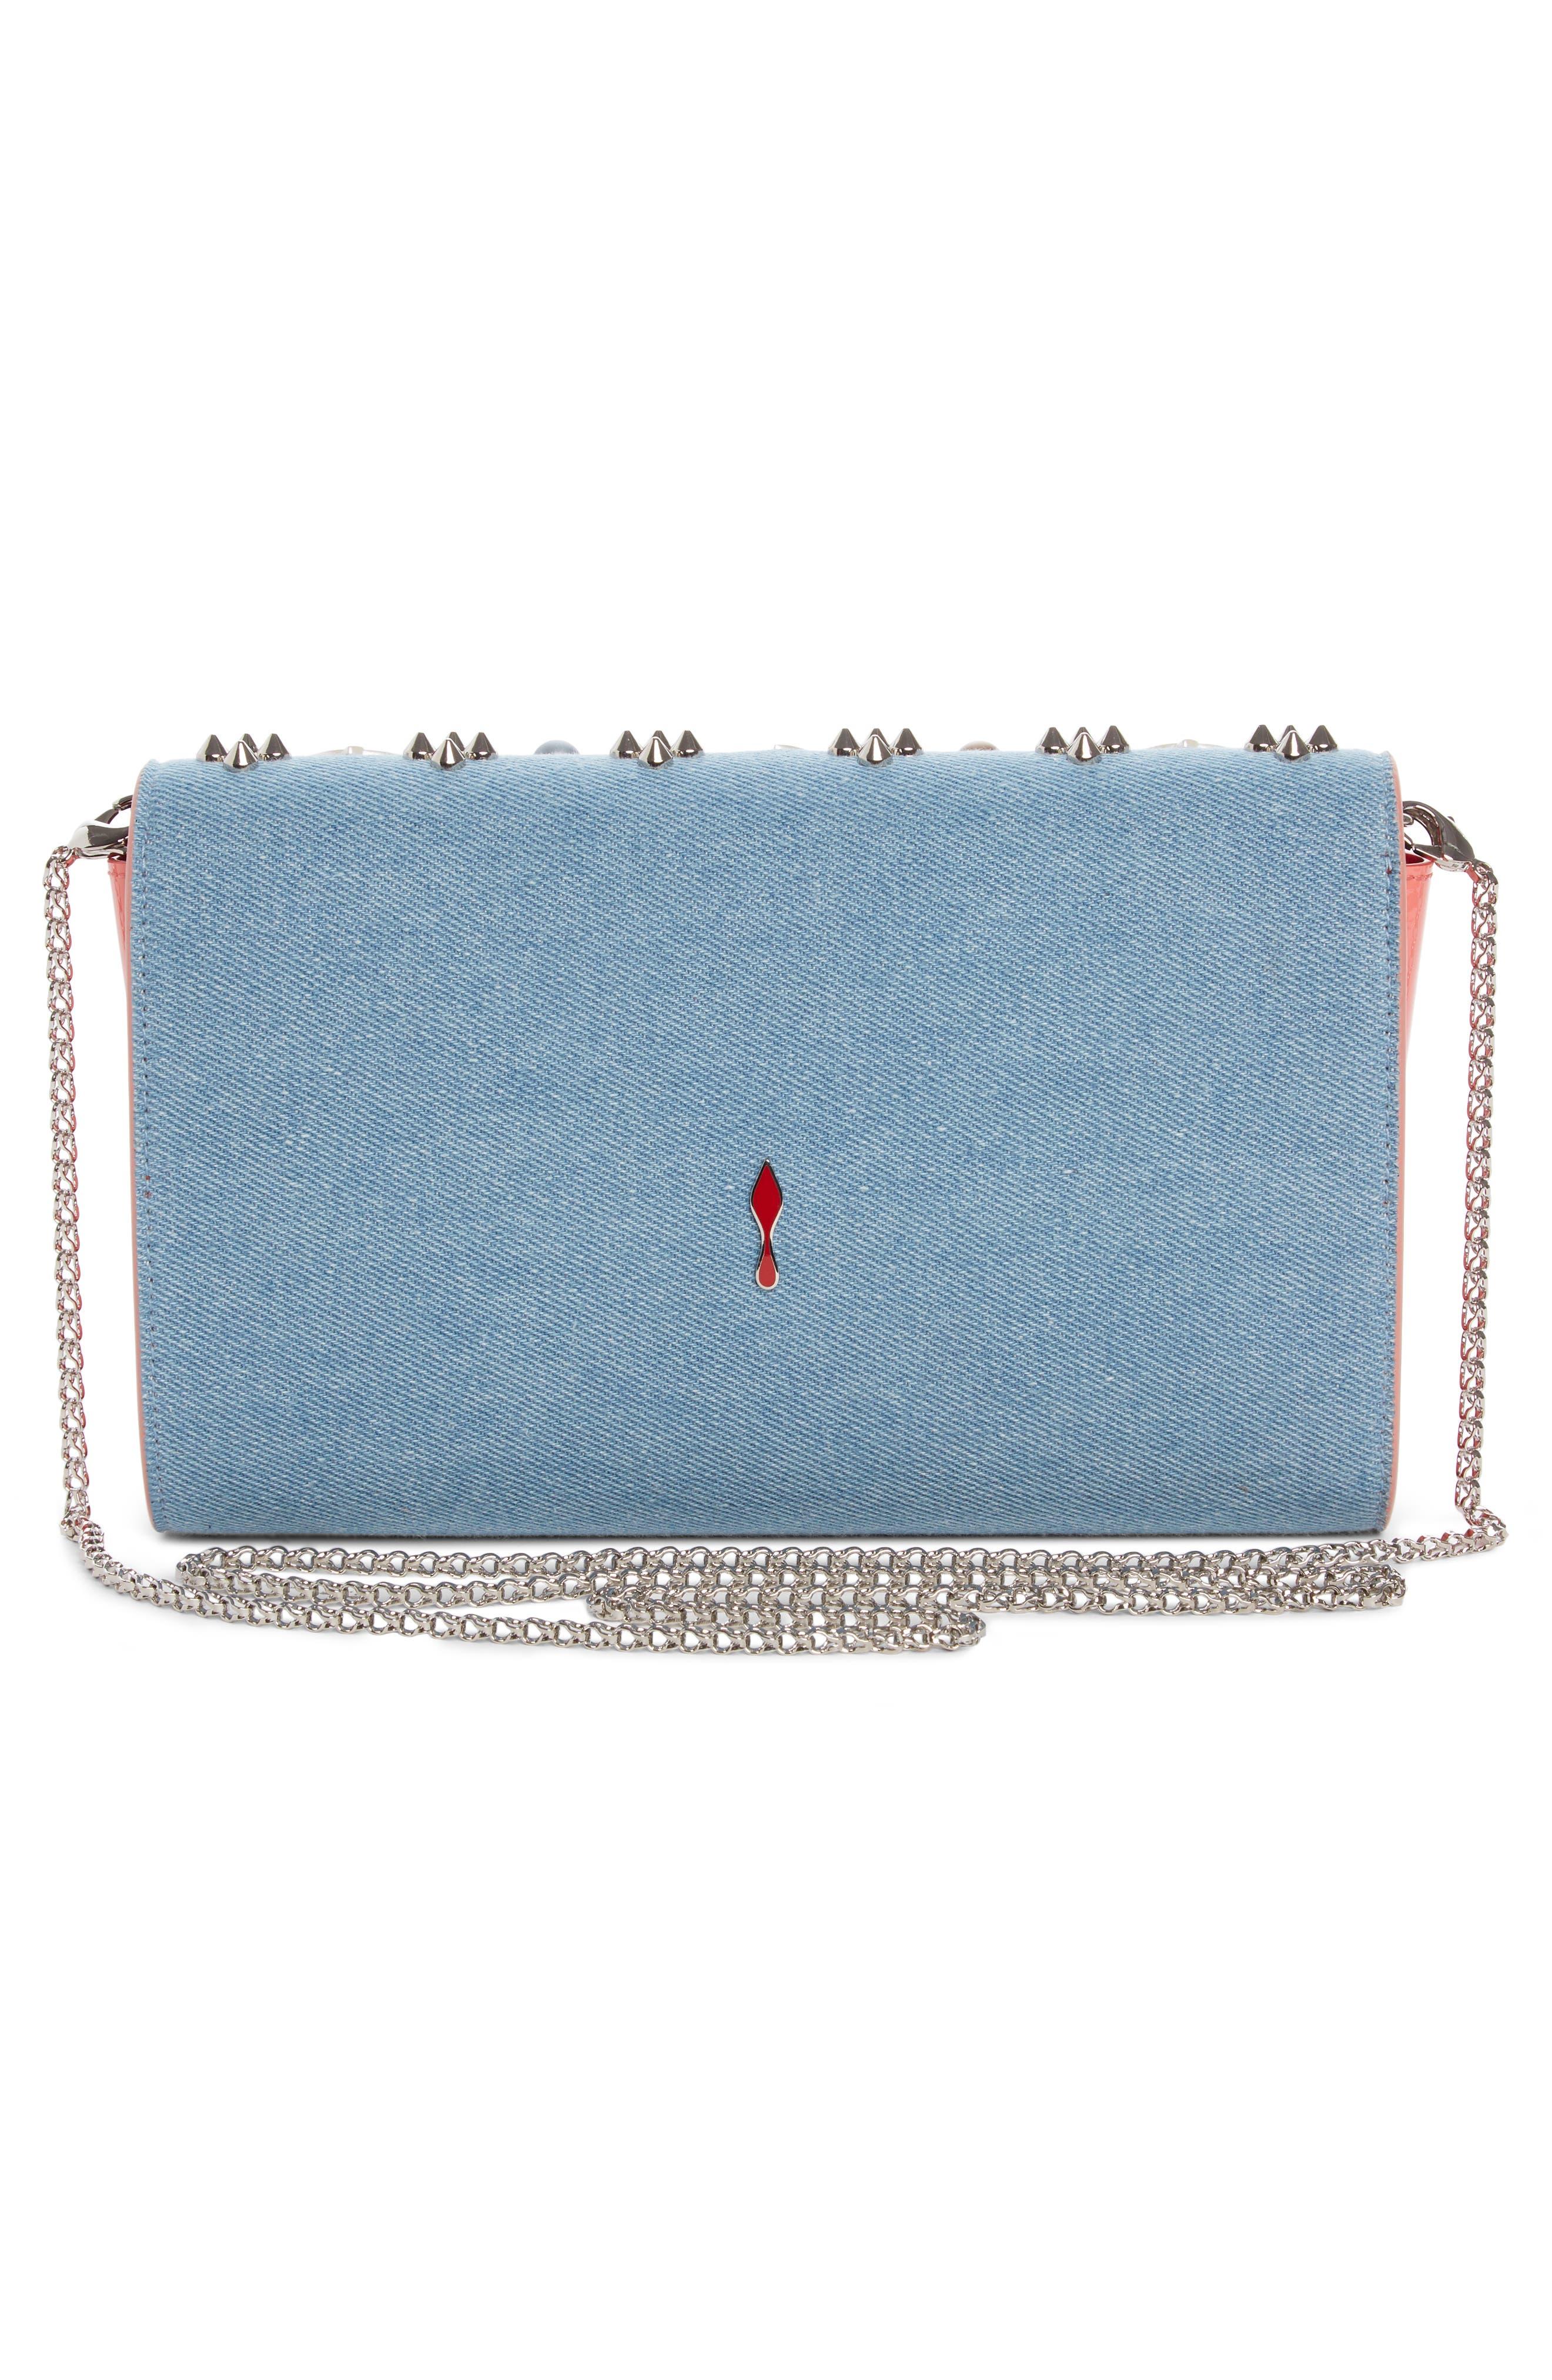 Paloma Studded Denim Clutch,                             Alternate thumbnail 2, color,                             BLUE/ PEARL MIX